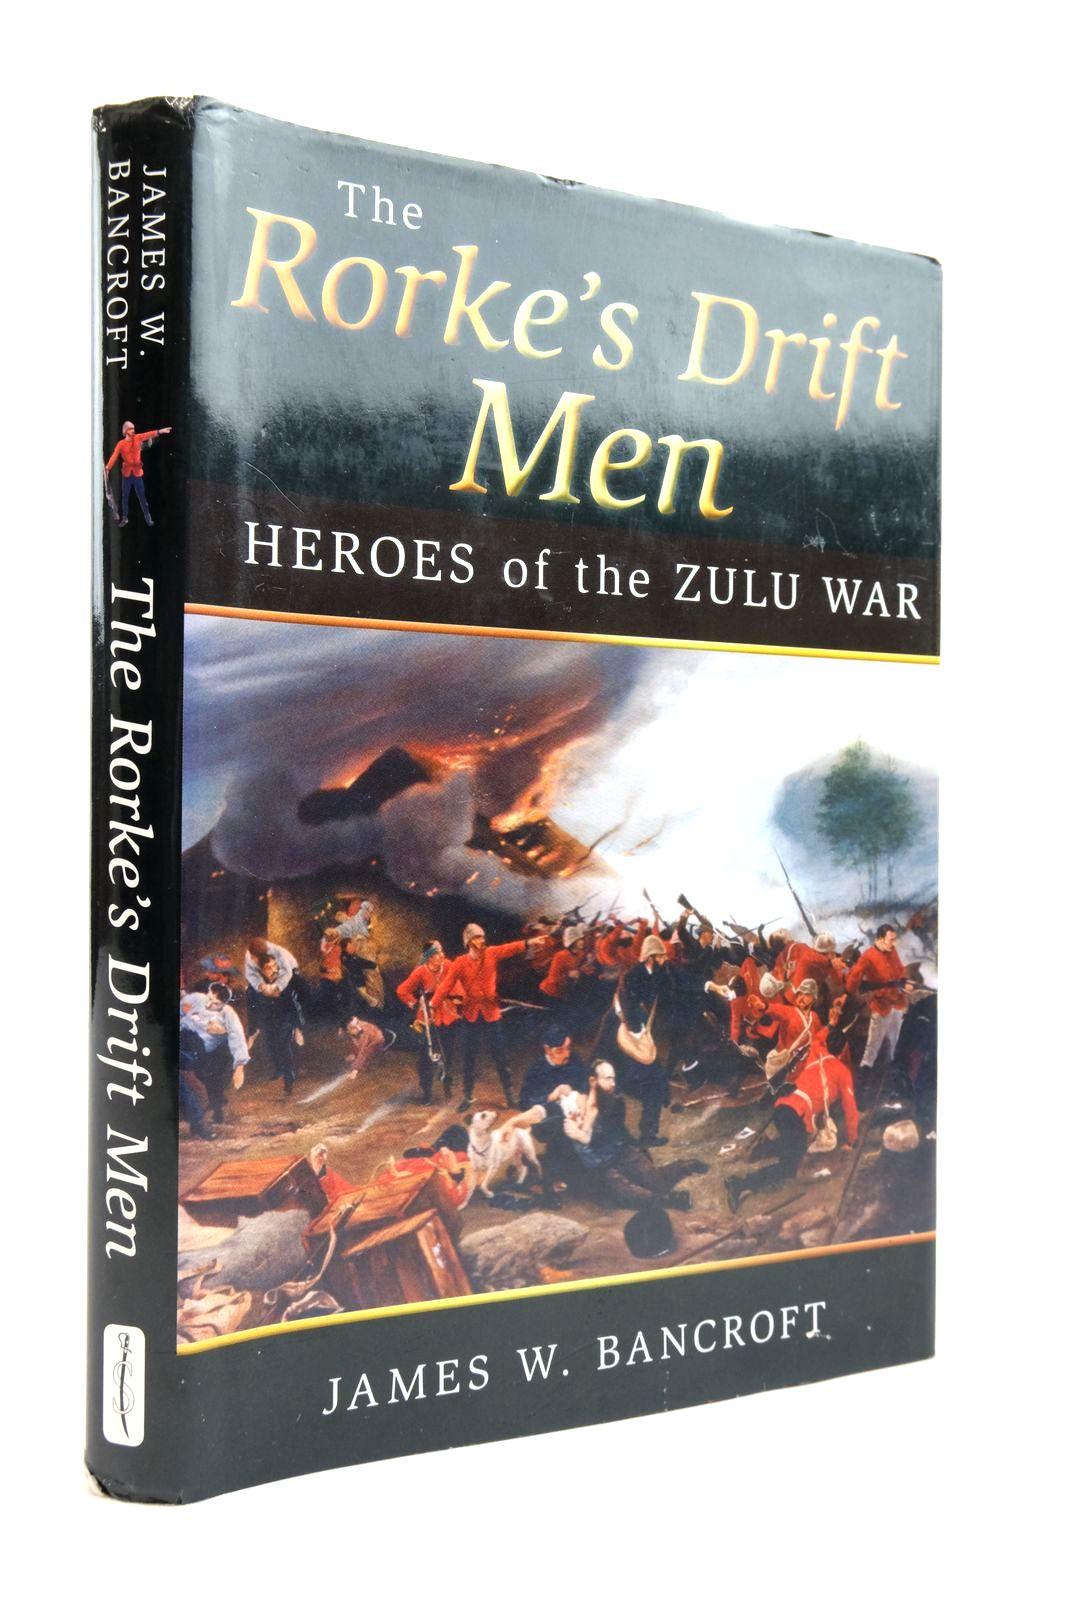 Photo of THE RORKE'S DRIFT MEN- Stock Number: 2135383